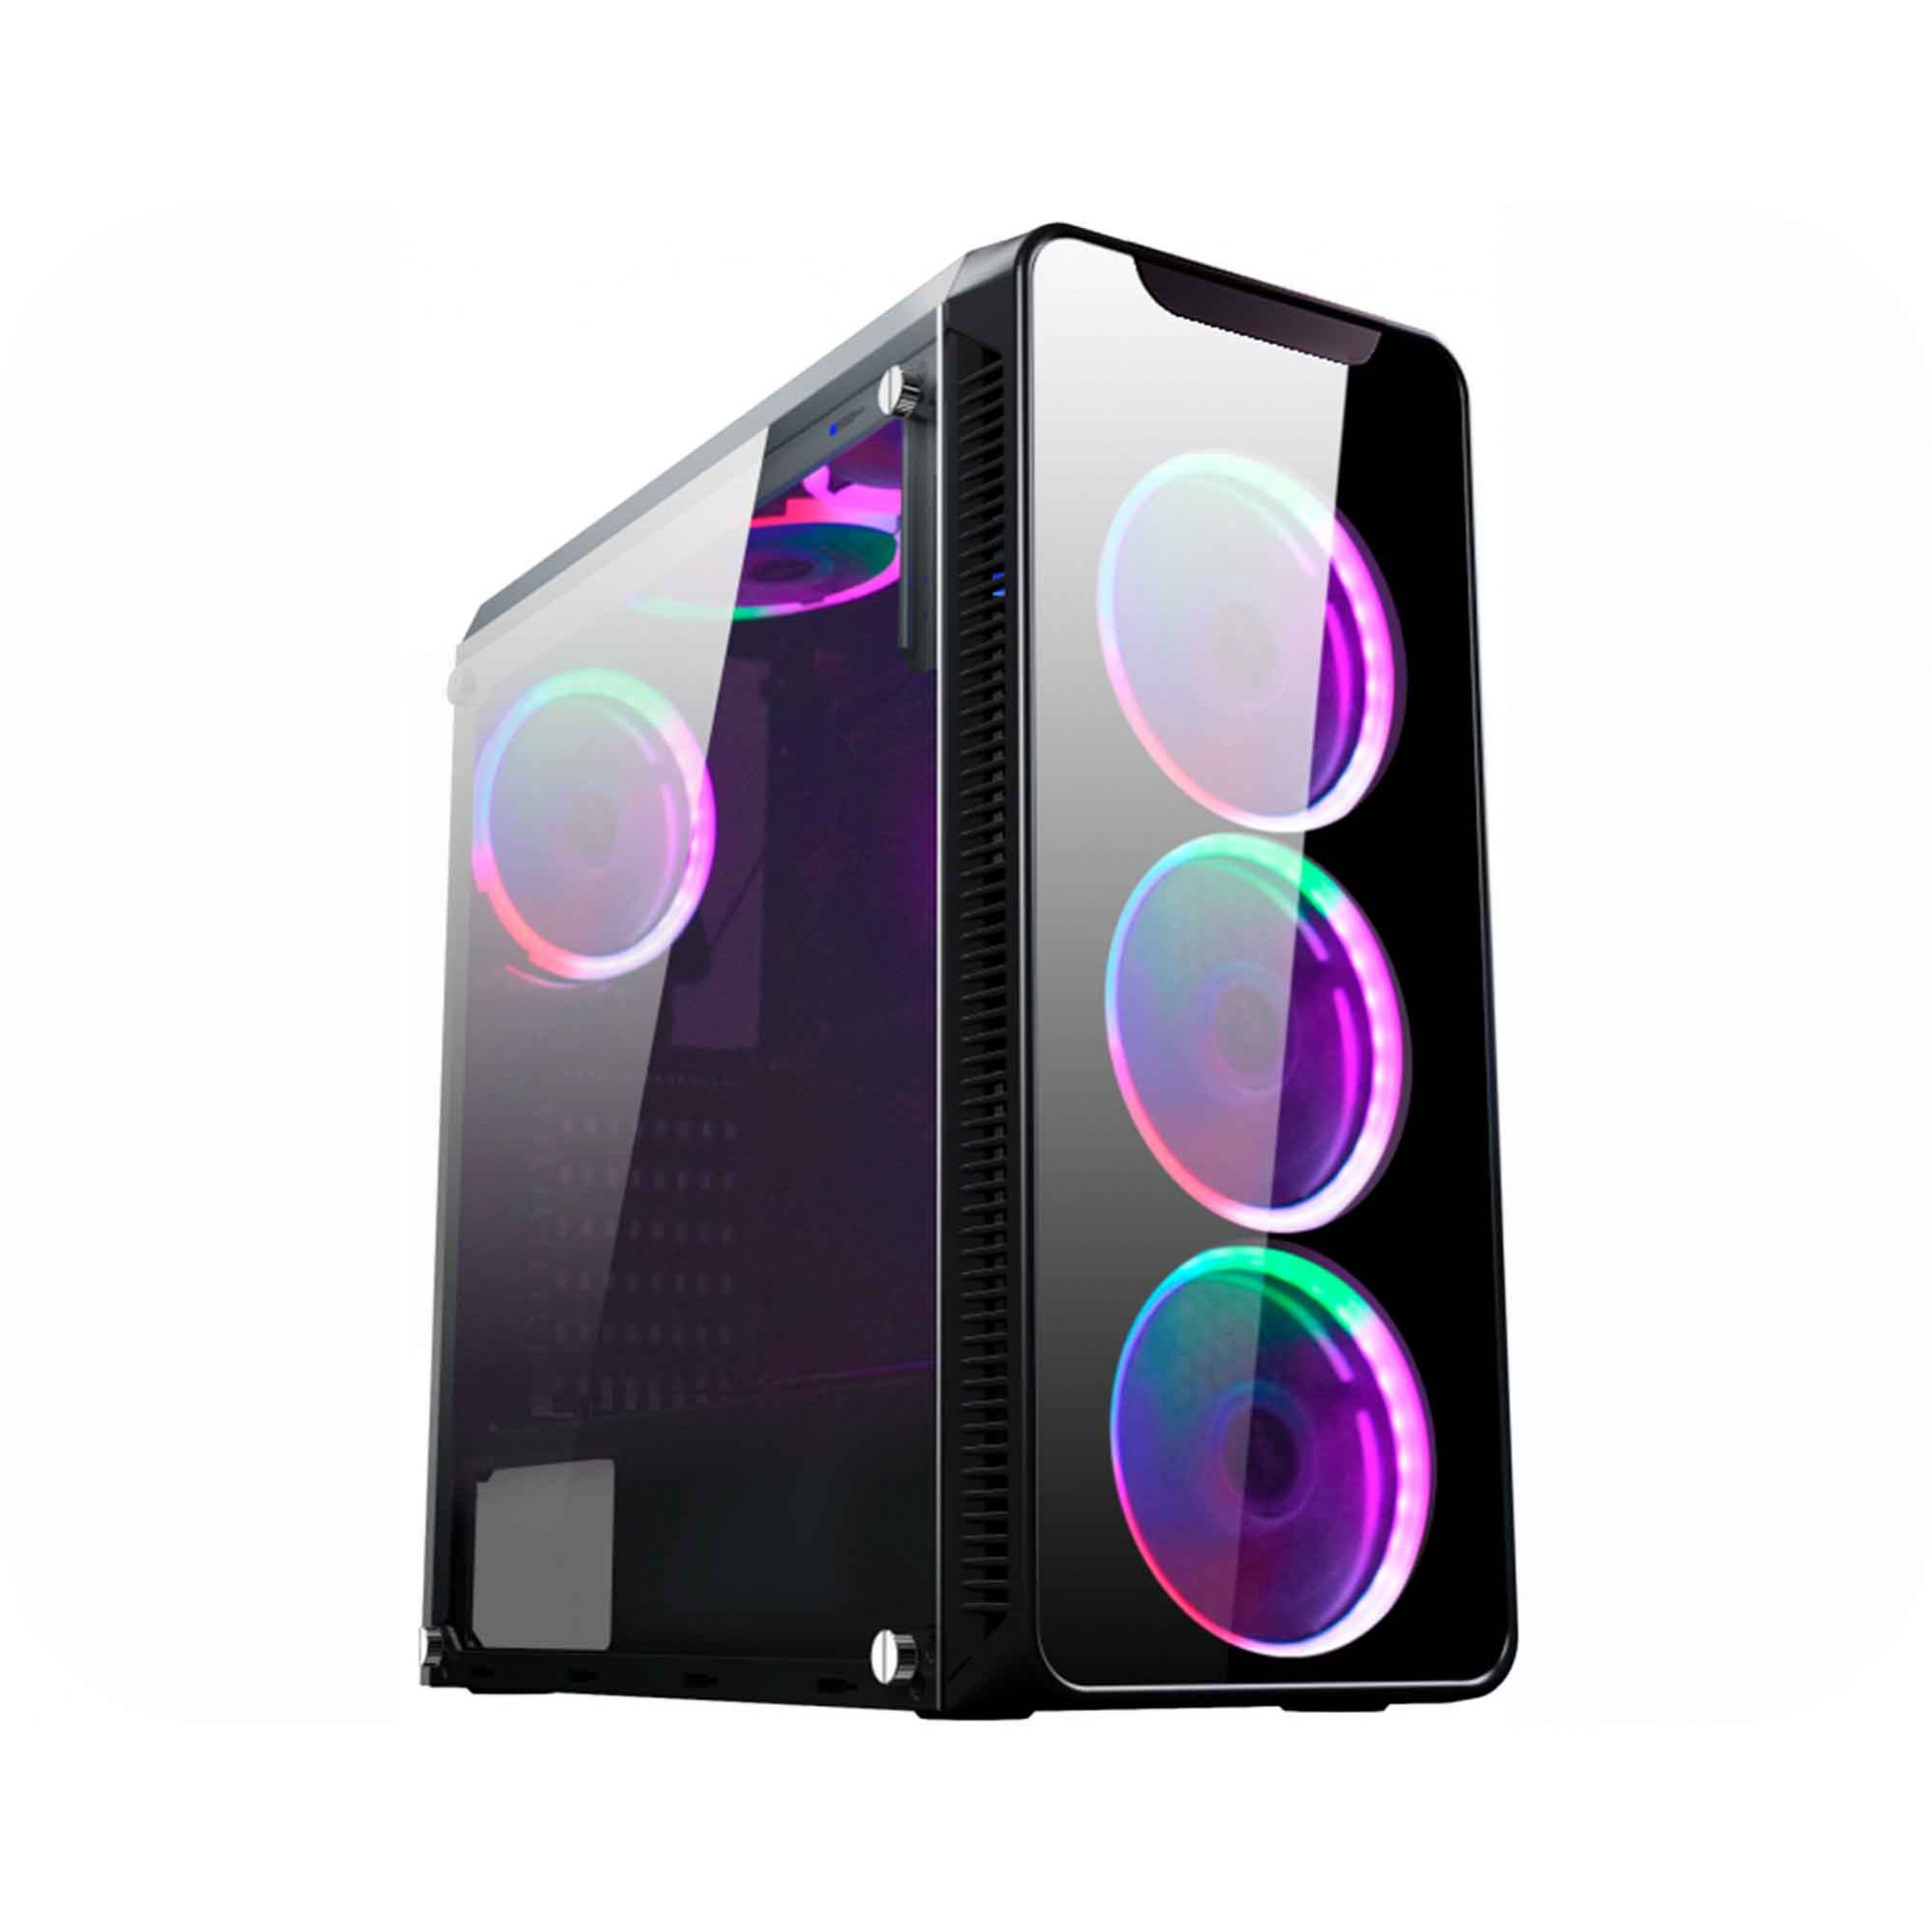 Gabinete Gamer Atx K-Mex Infinity I CG-01G8 c/3 Fans 5 cores - Sem Fonte